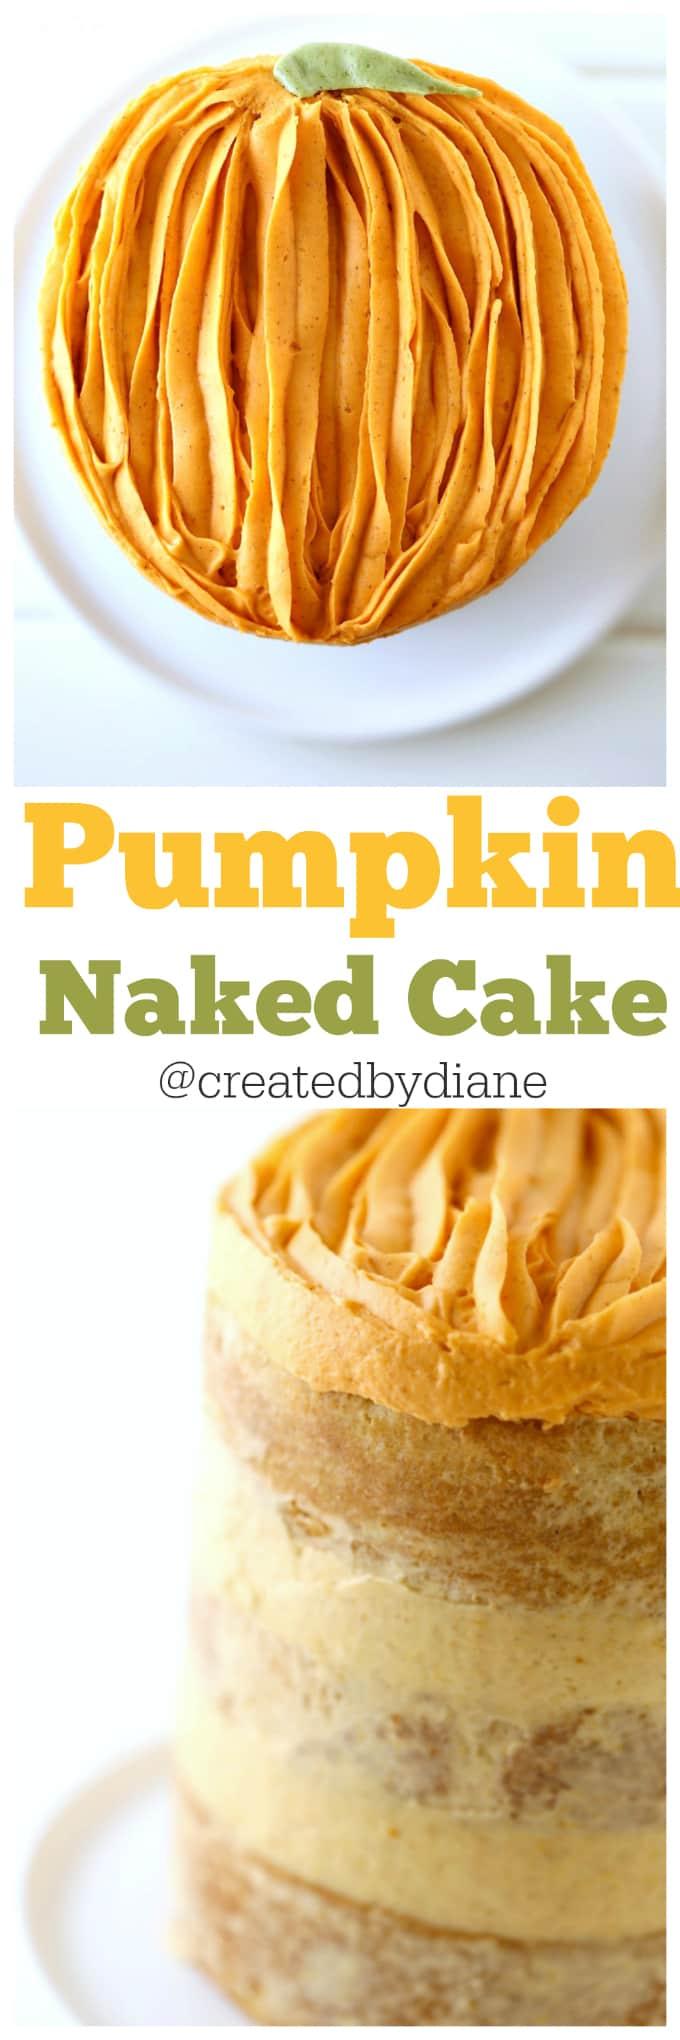 pumpkin-naked-cake-createdbydiane